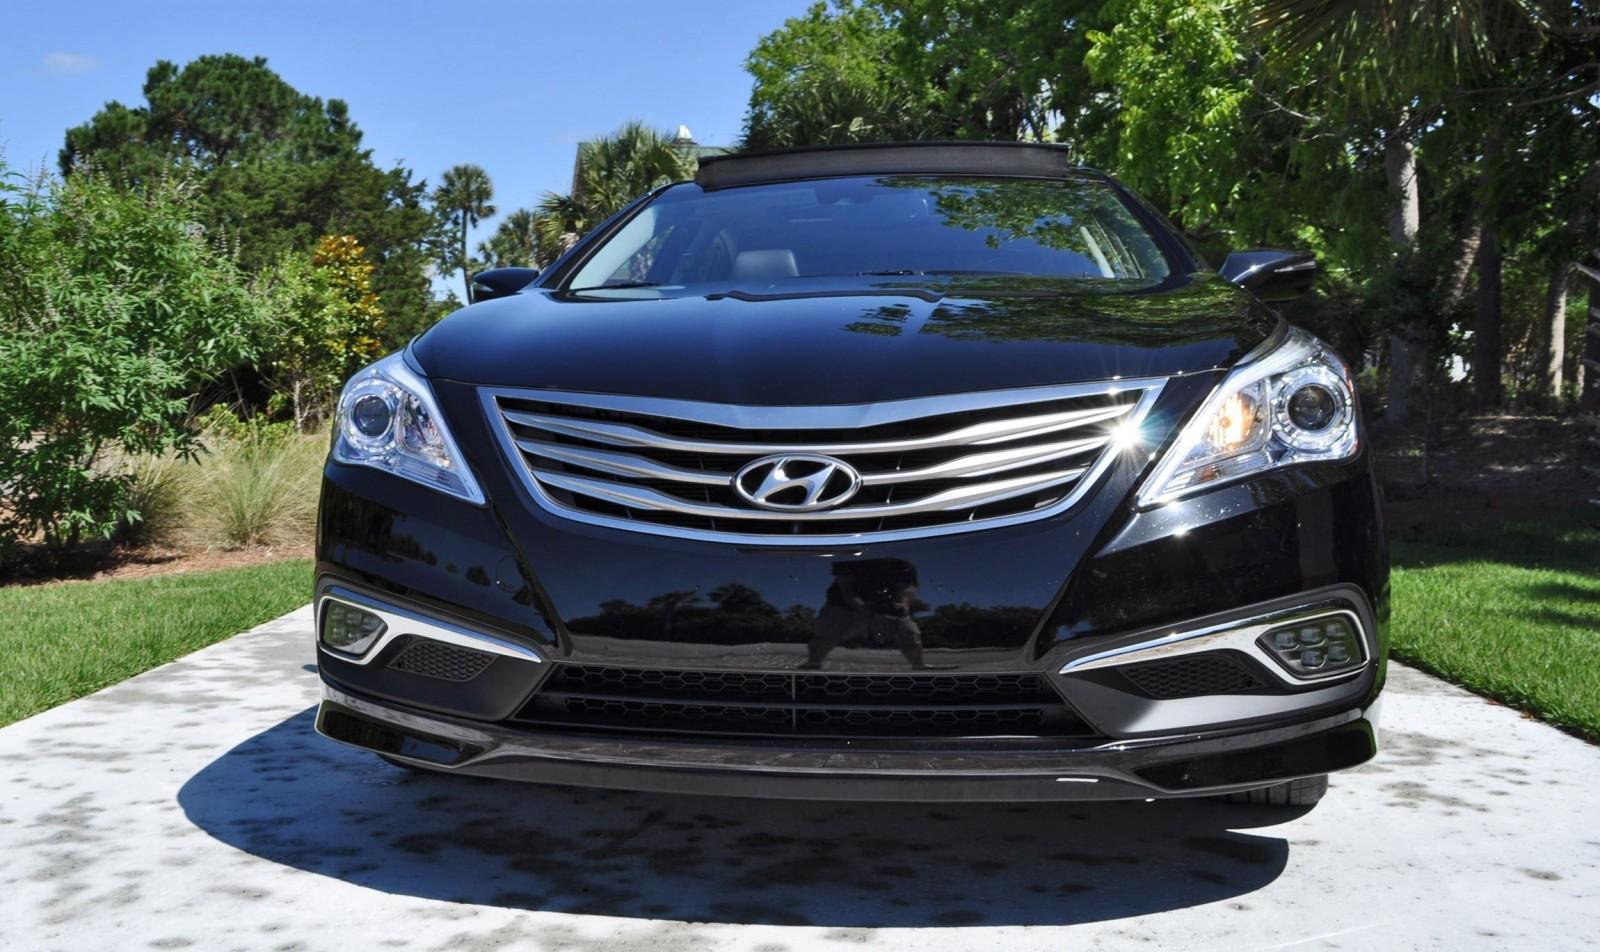 Road Test Review - 2015 Hyundai AZERA Limited 74